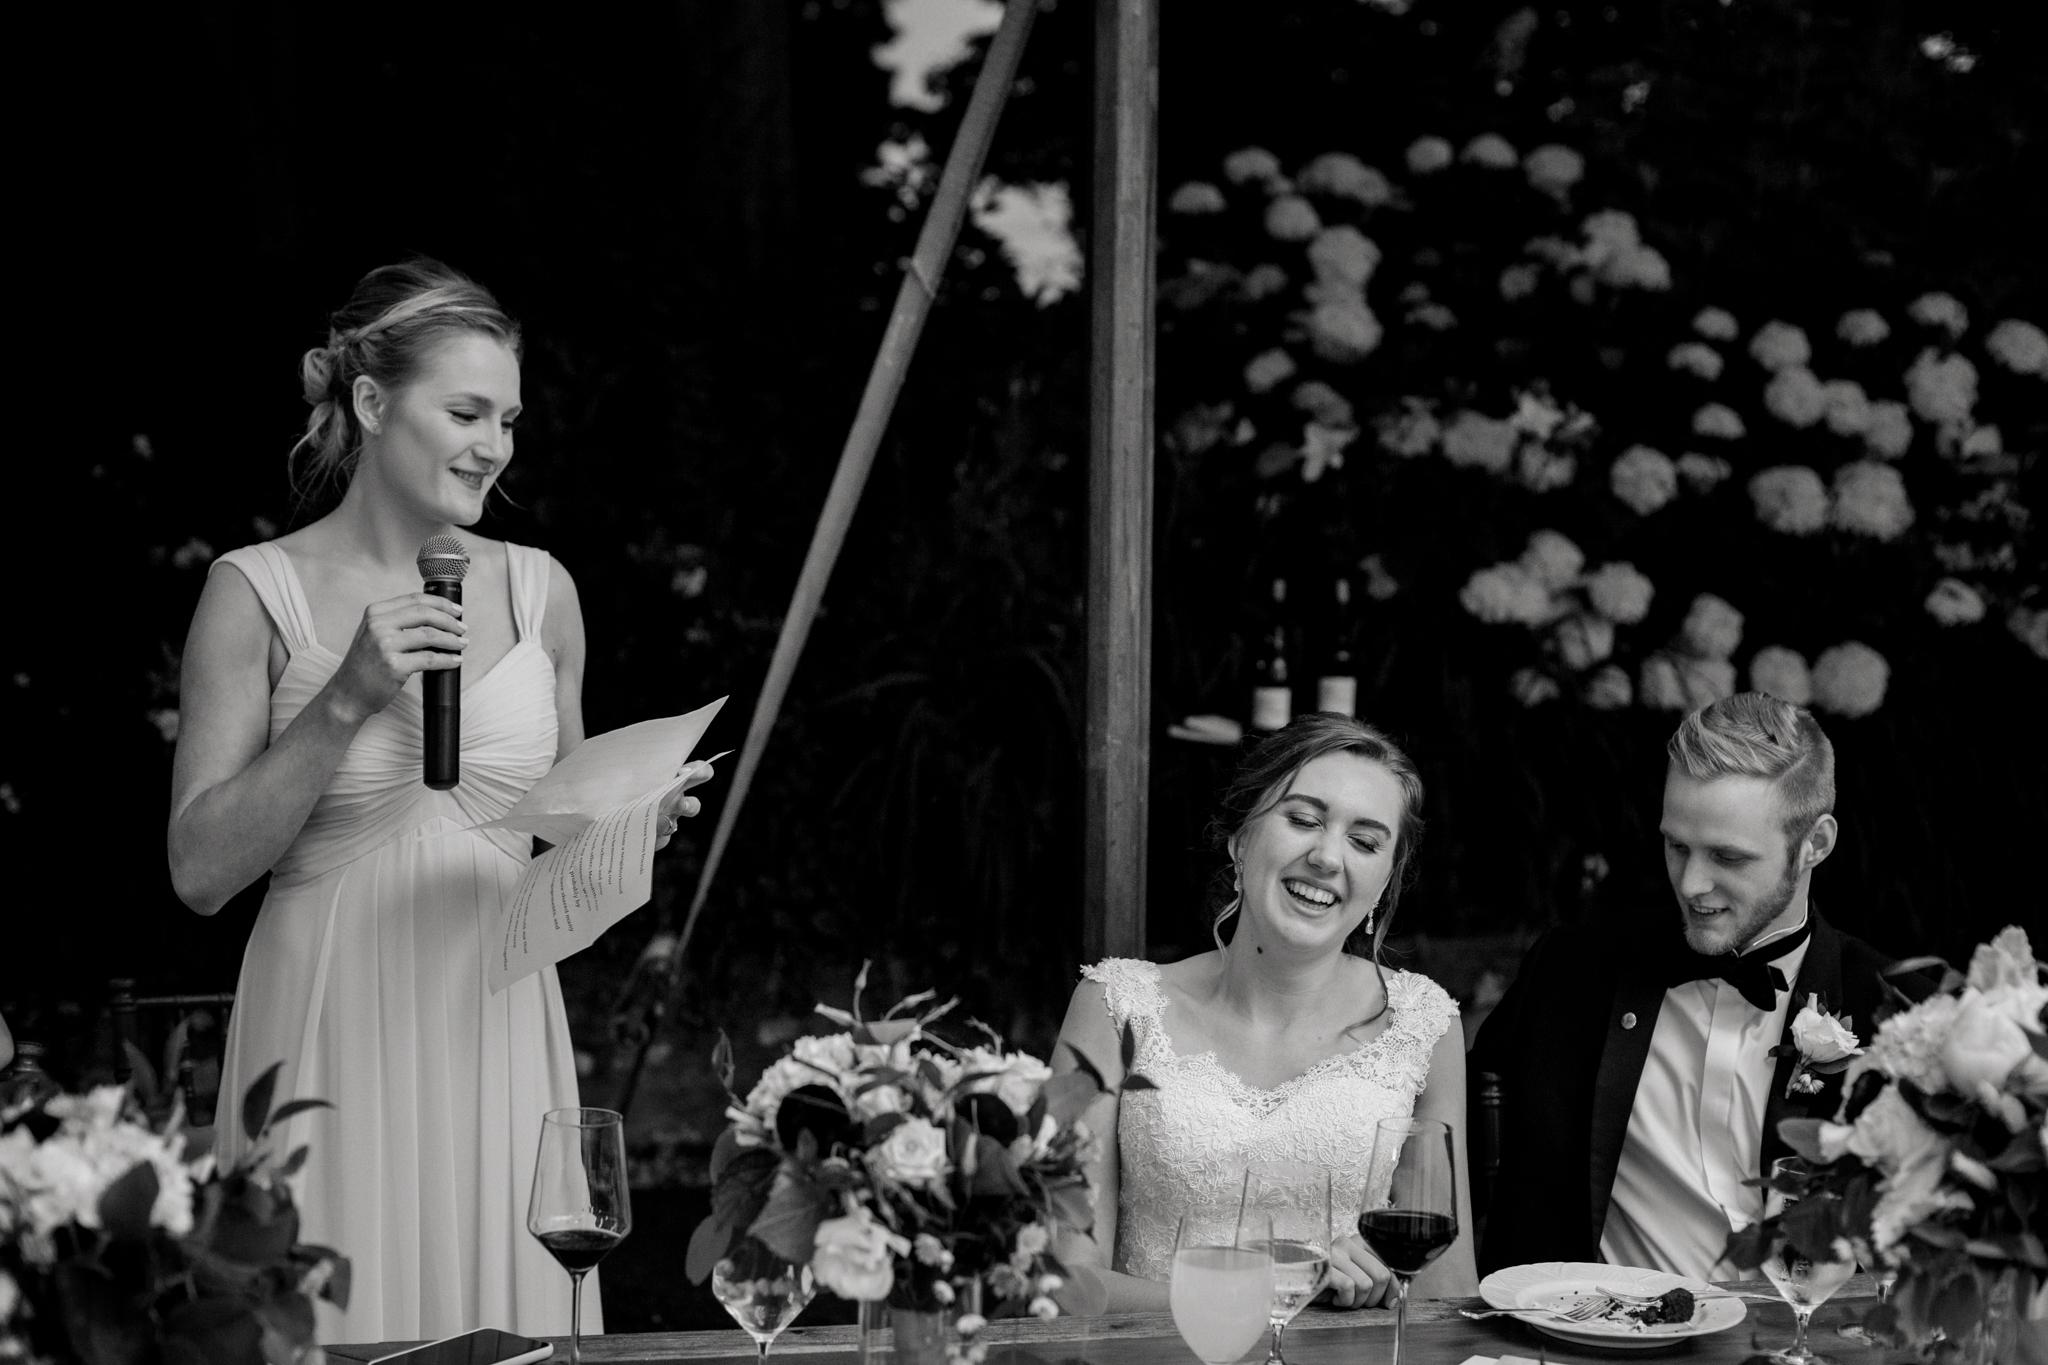 Keswick-Vineyards-Wedding_86.jpg